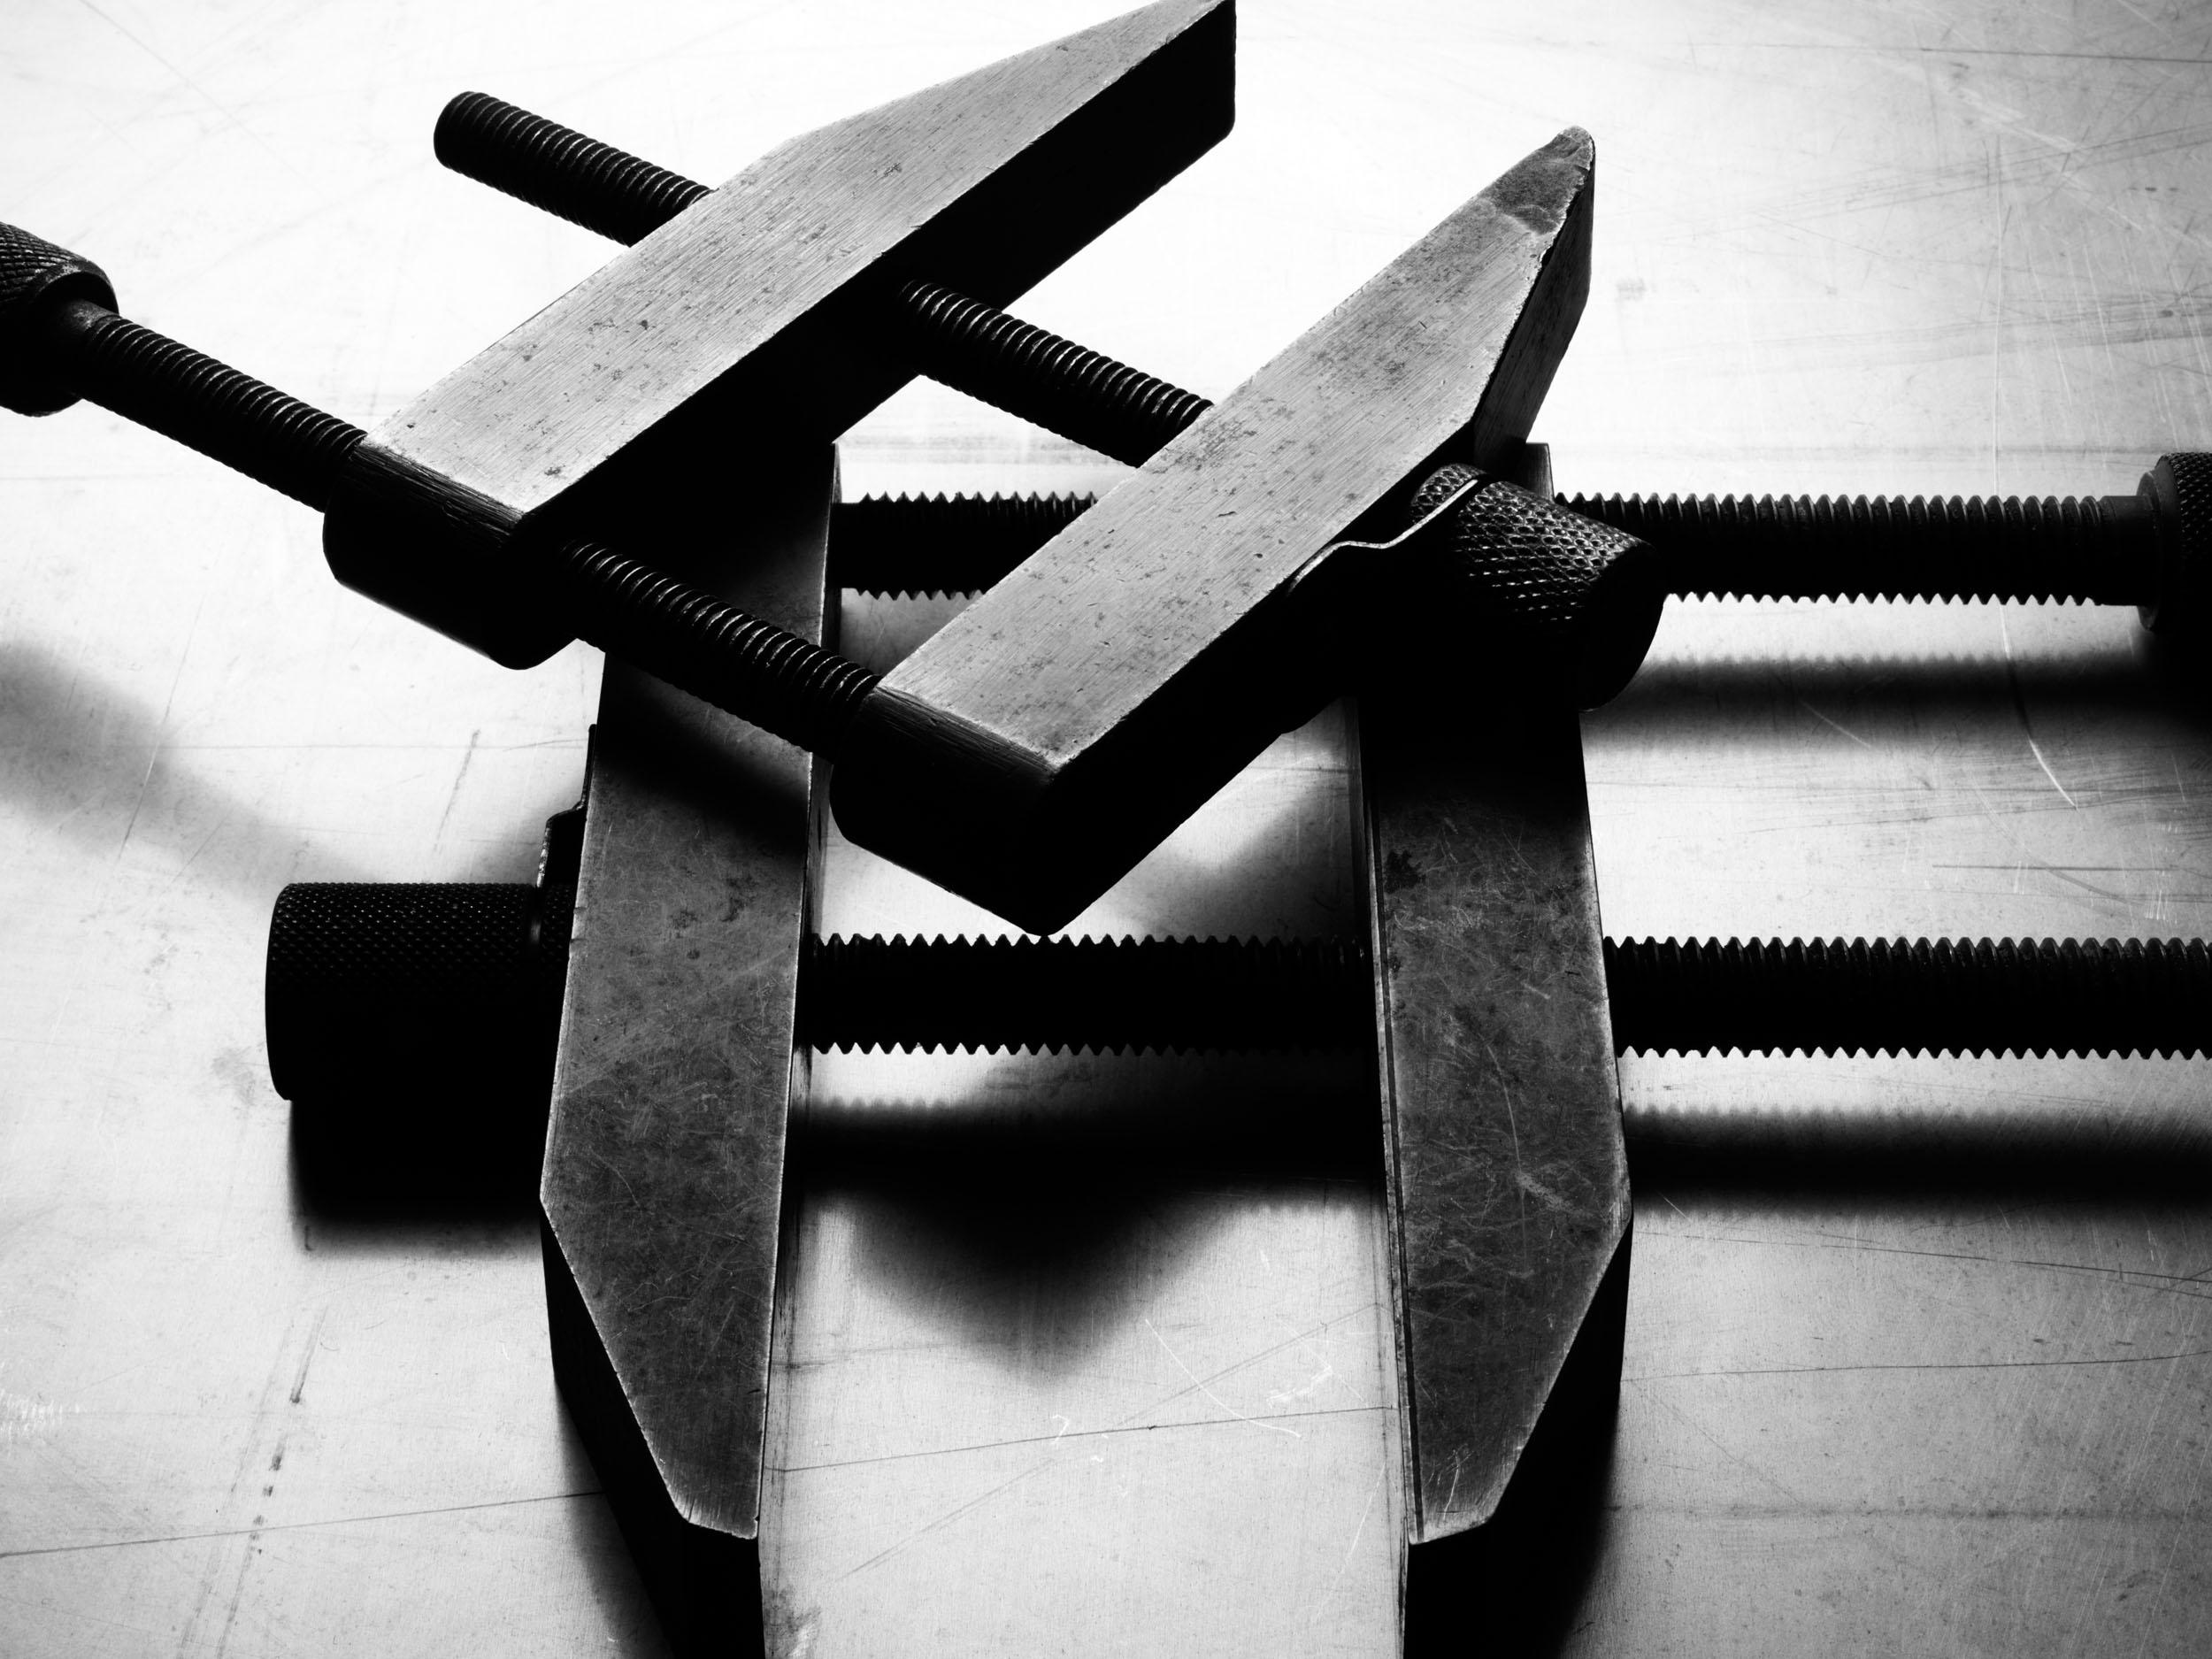 +metal_clamps_009.jpg